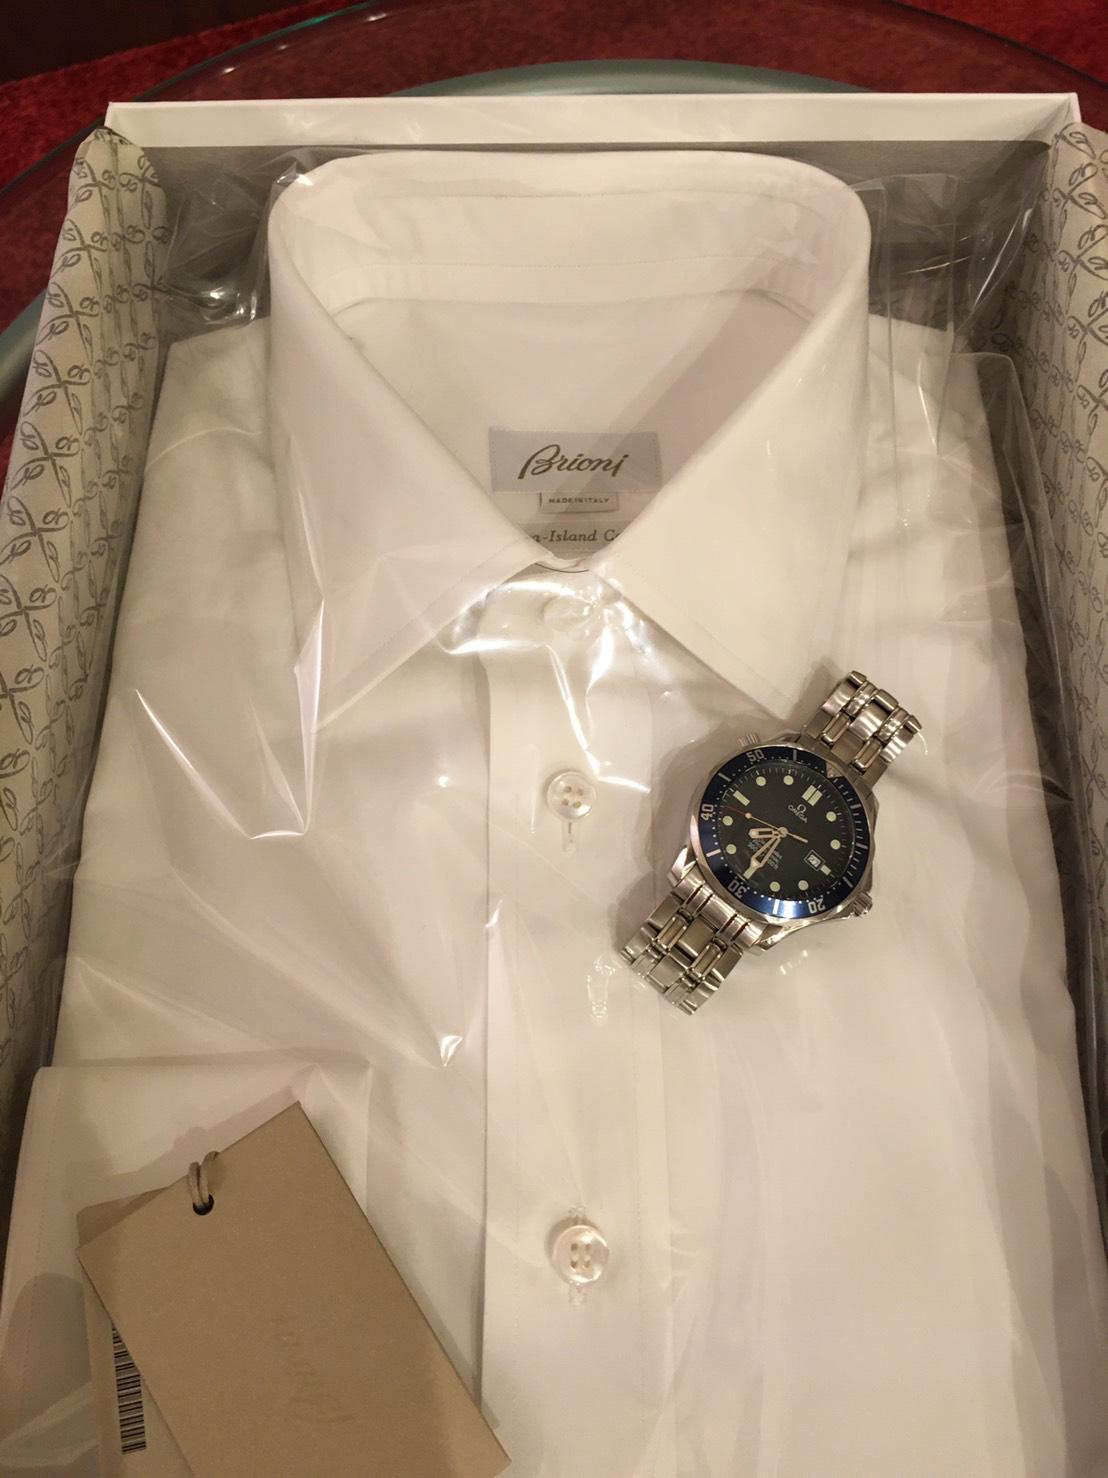 Brioni Bespoke Shirt arrival